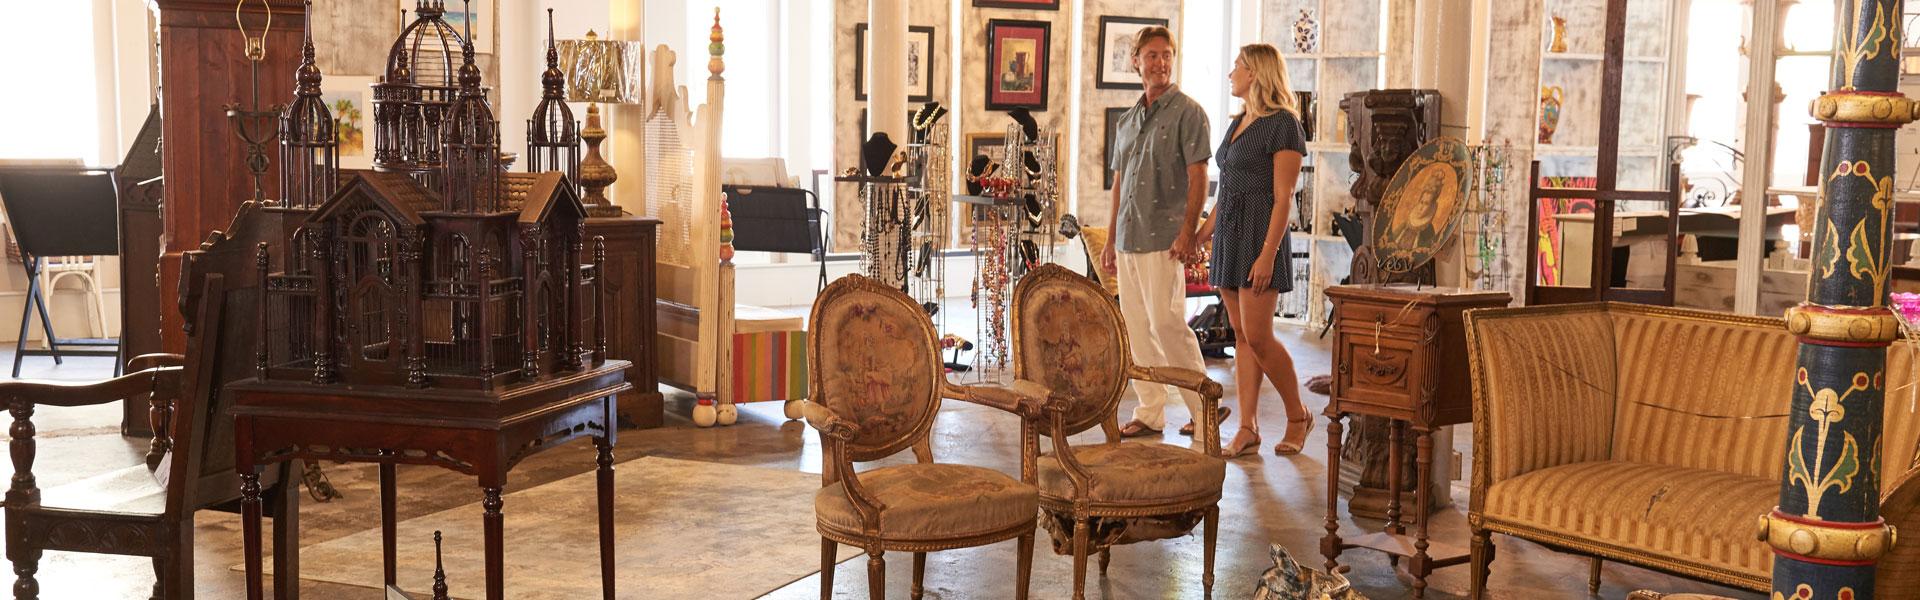 Couple Shopping in Eiband's Emporium, Galveston TX